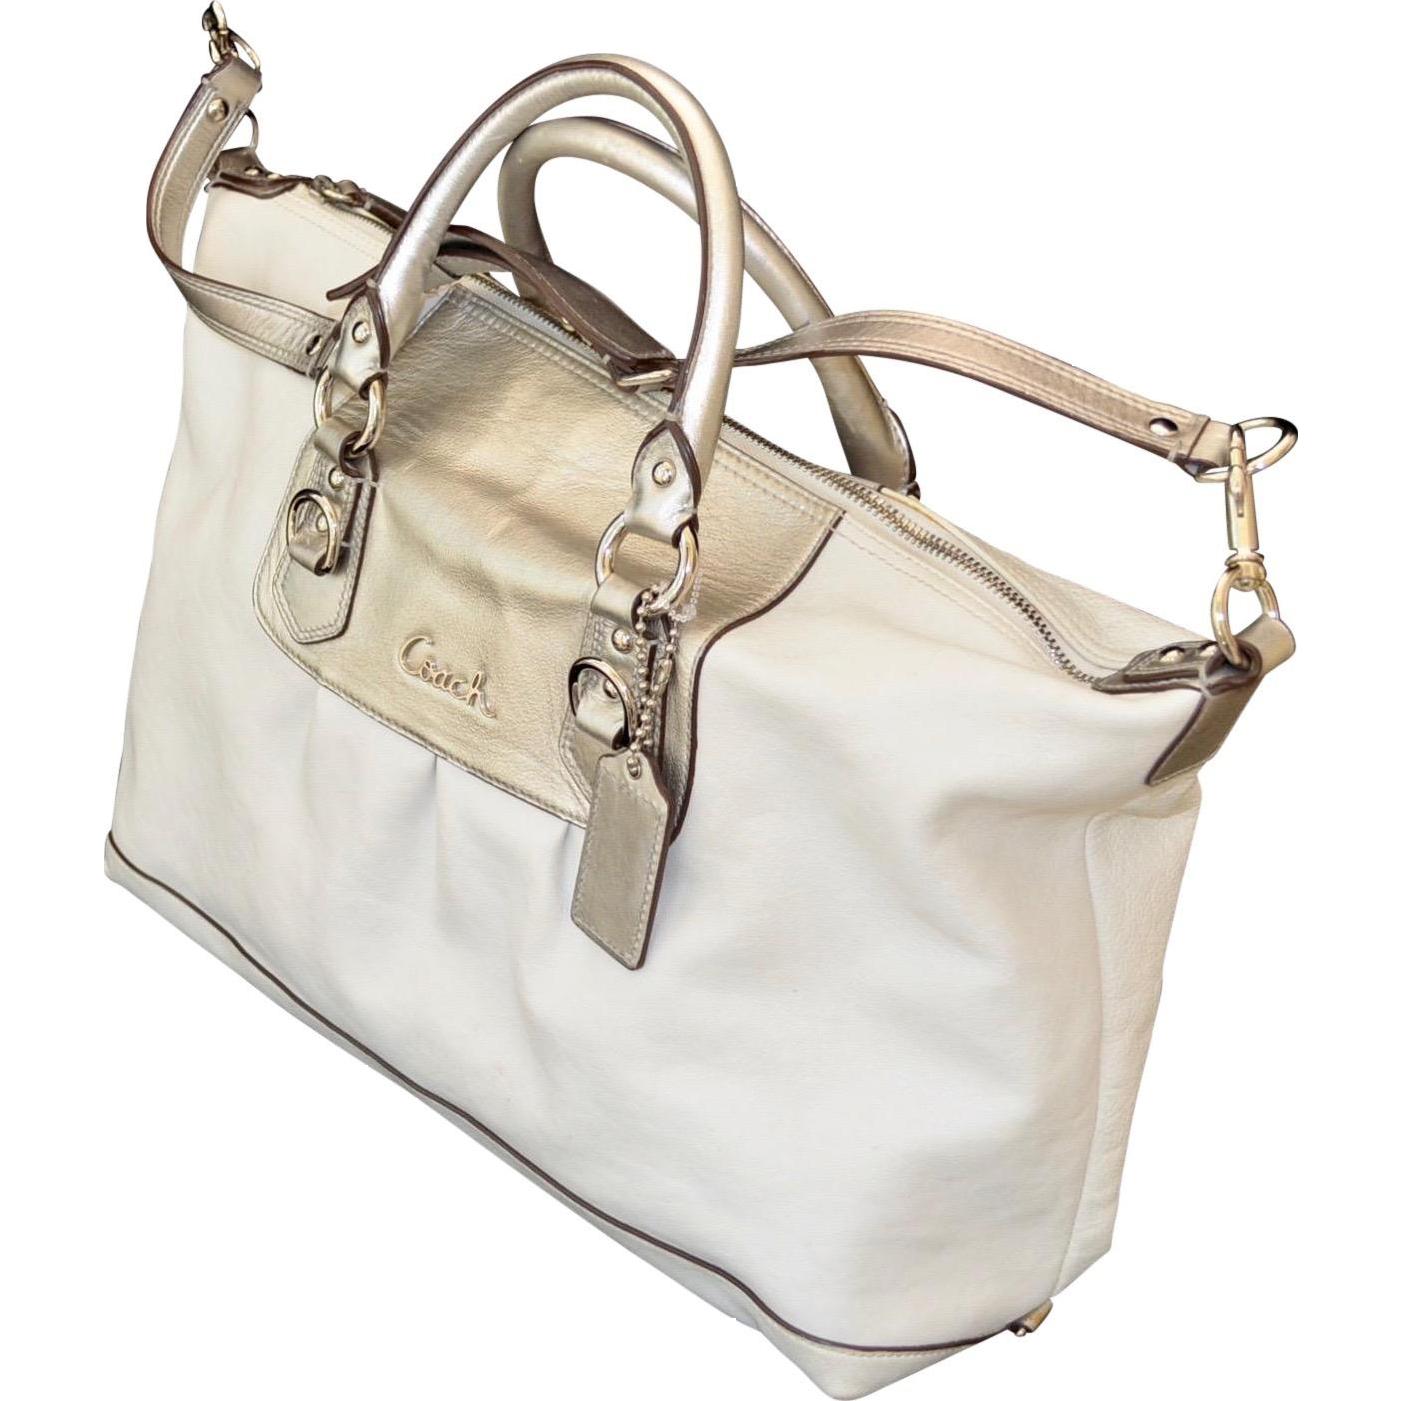 Silver White Coach Ashley Leather Satchel Style Handbag